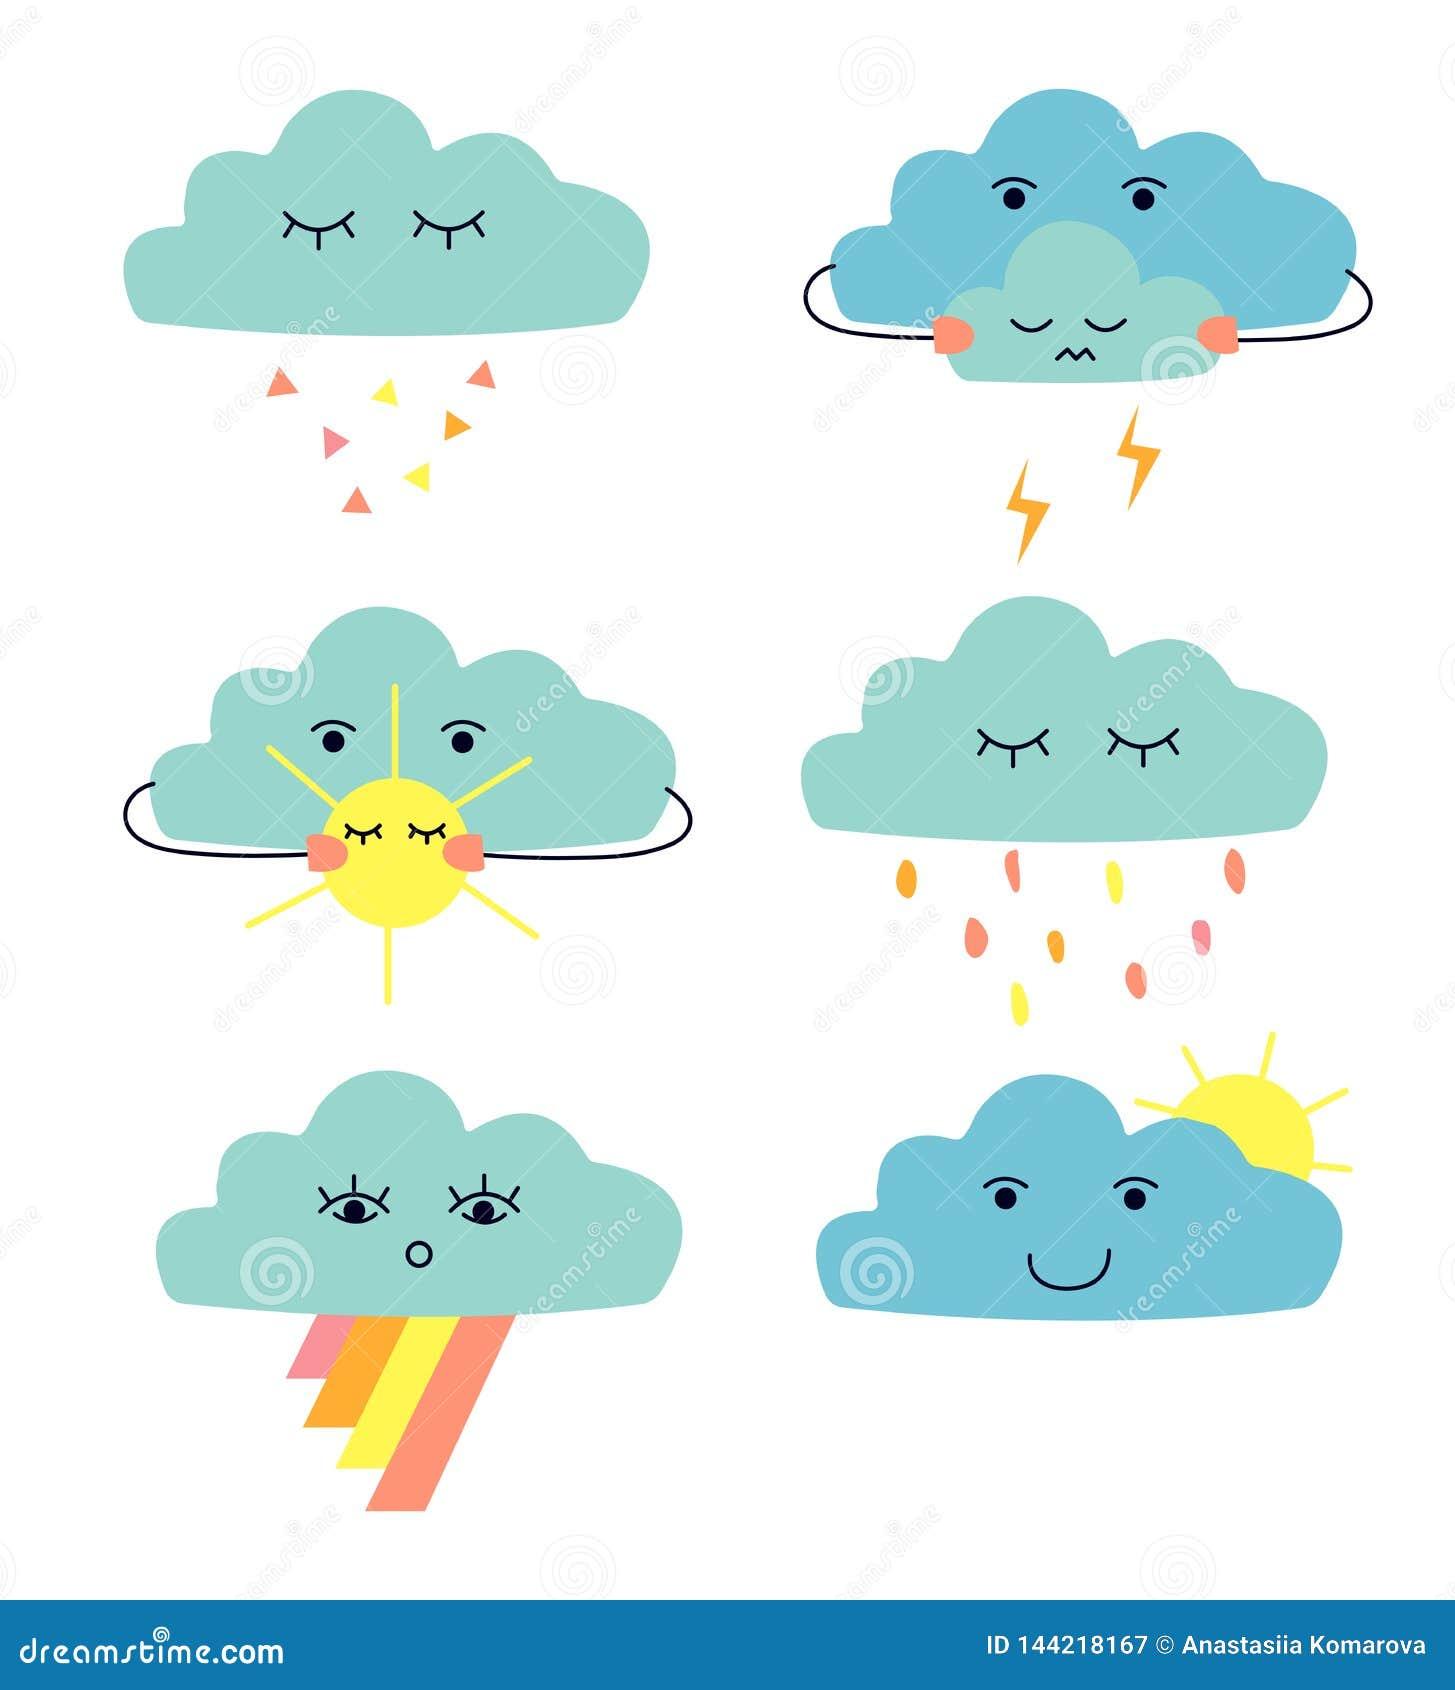 Fije de las nubes lindas de la historieta: nube de lluvia; nube de trueno; sol del witn de la nube; nube con el rainow